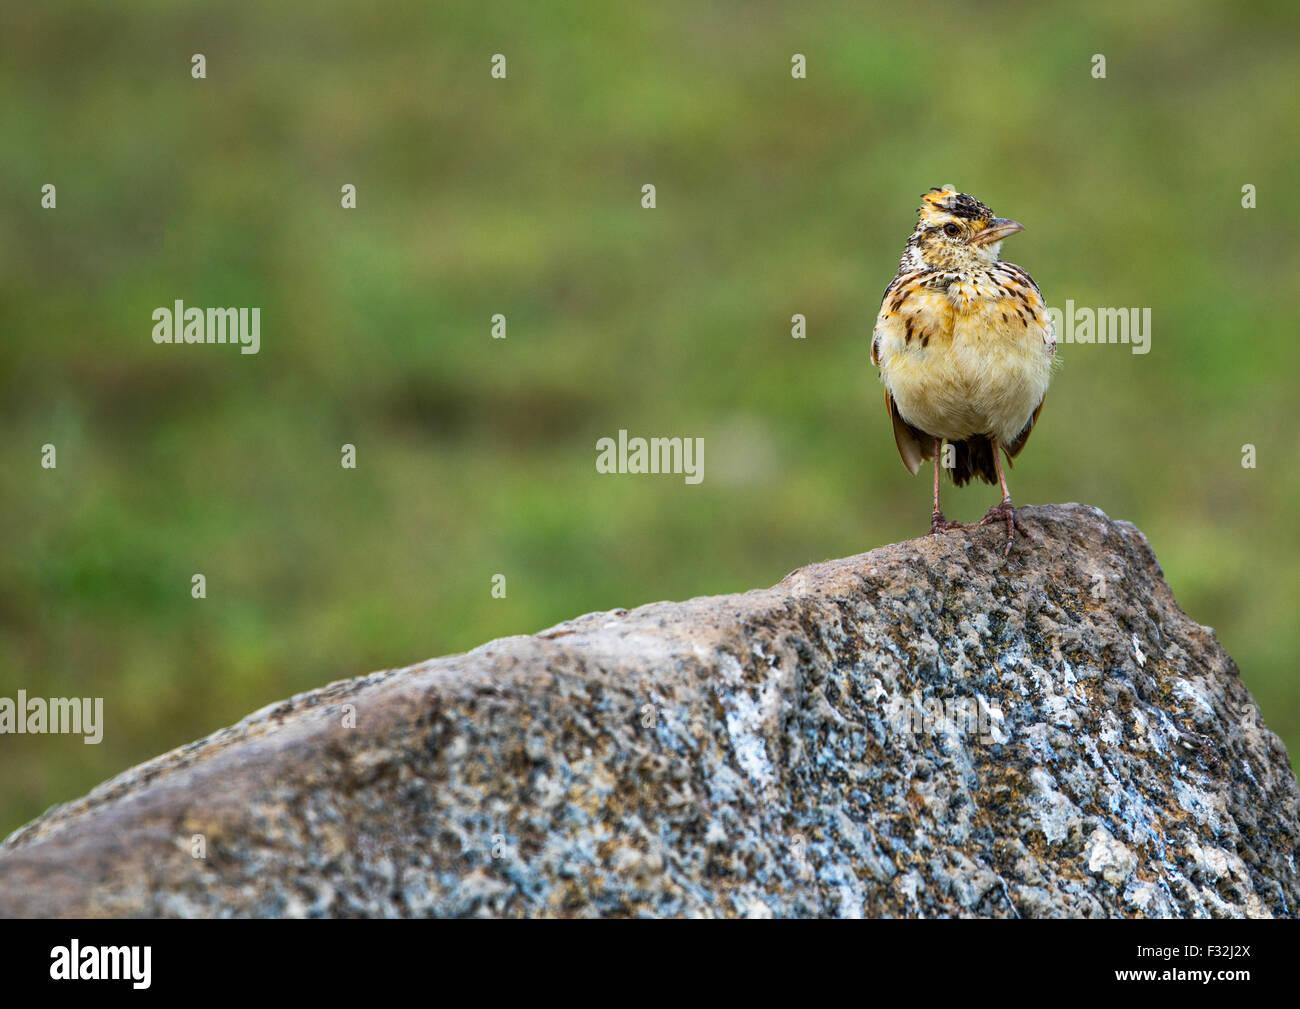 Tanzania, Mara, Serengeti National Park, rufous-naped lark (mirafra africana) on a rock Stock Photo